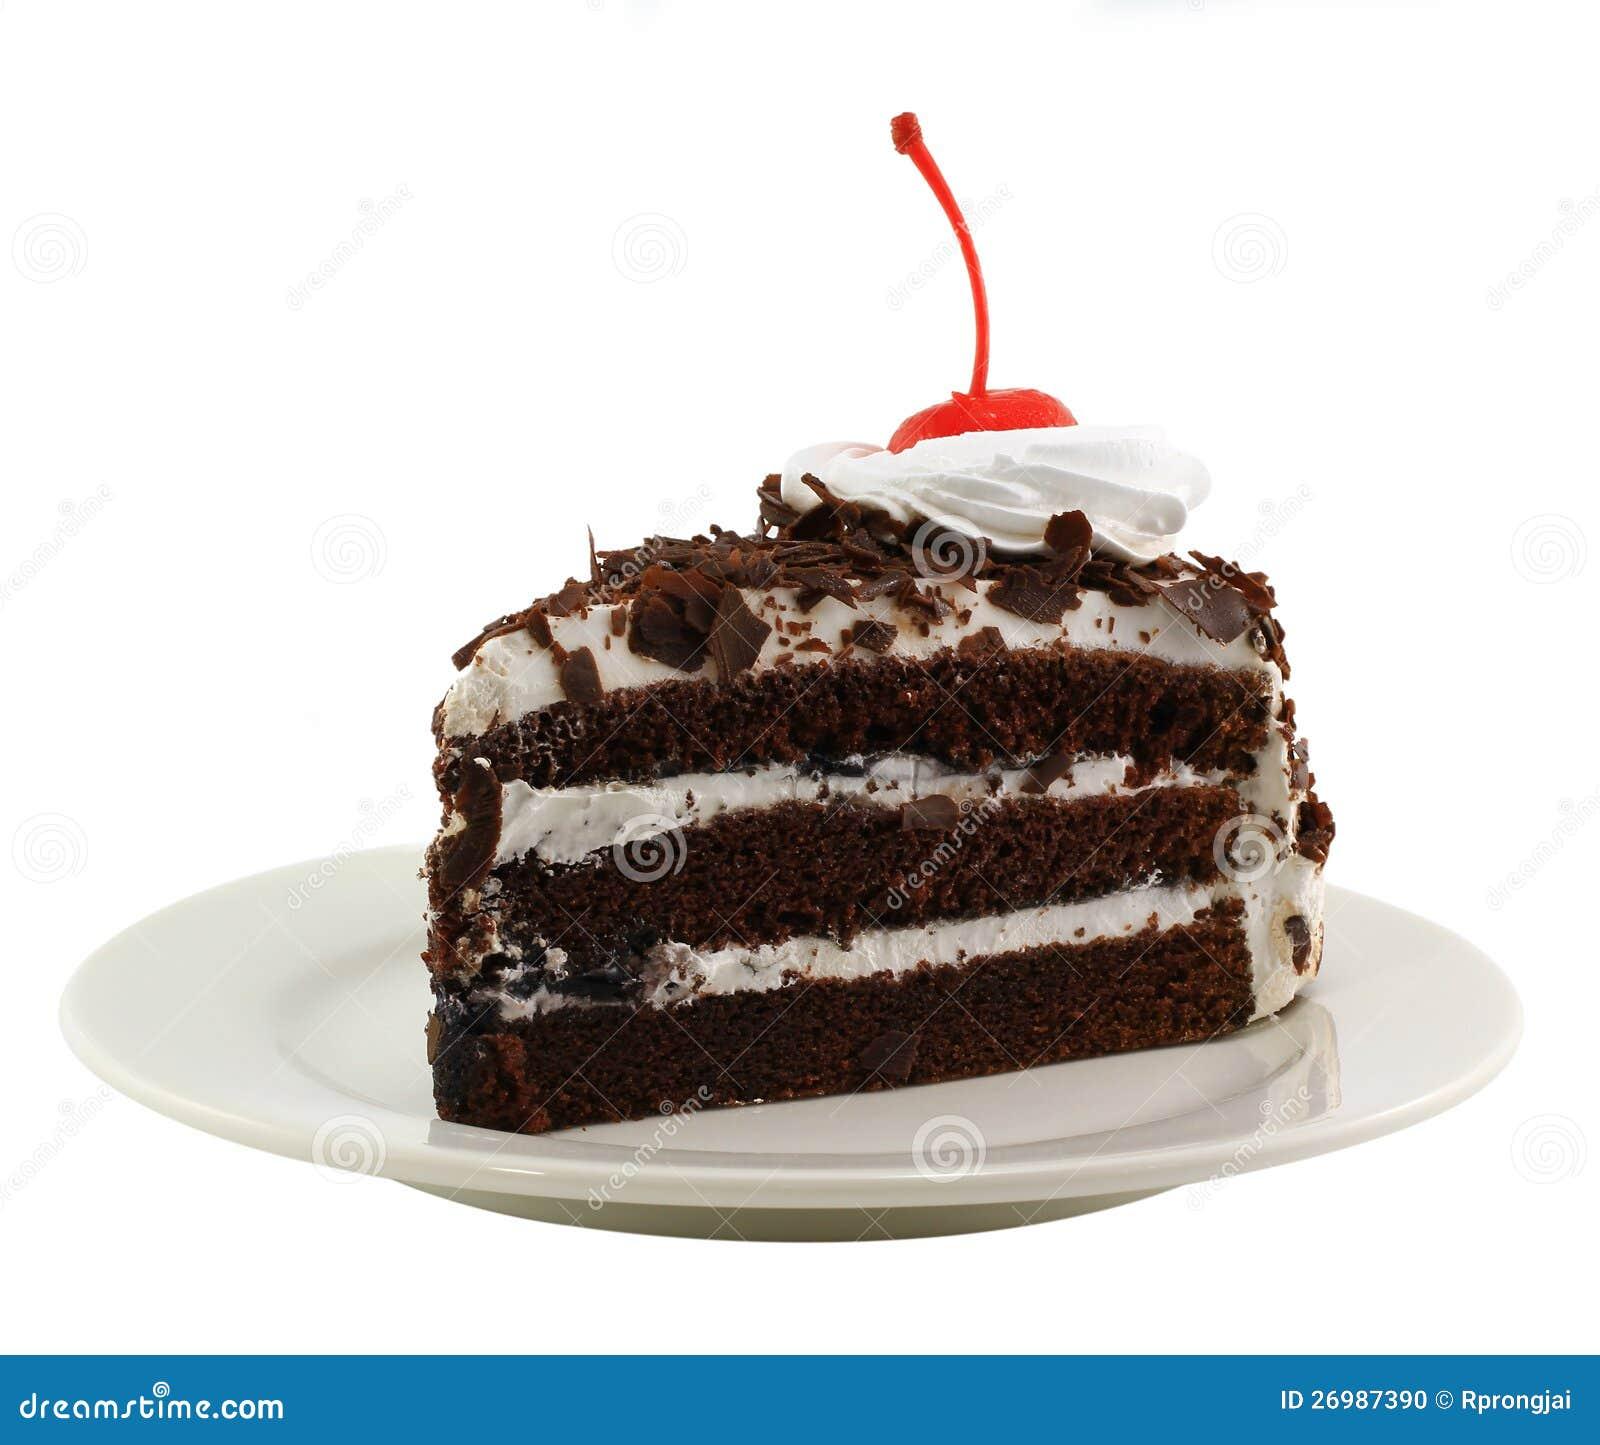 Images Of Beautiful Chocolate Cake : Beautiful Tasty Chocolate Cake Stock Photo - Image: 26987390